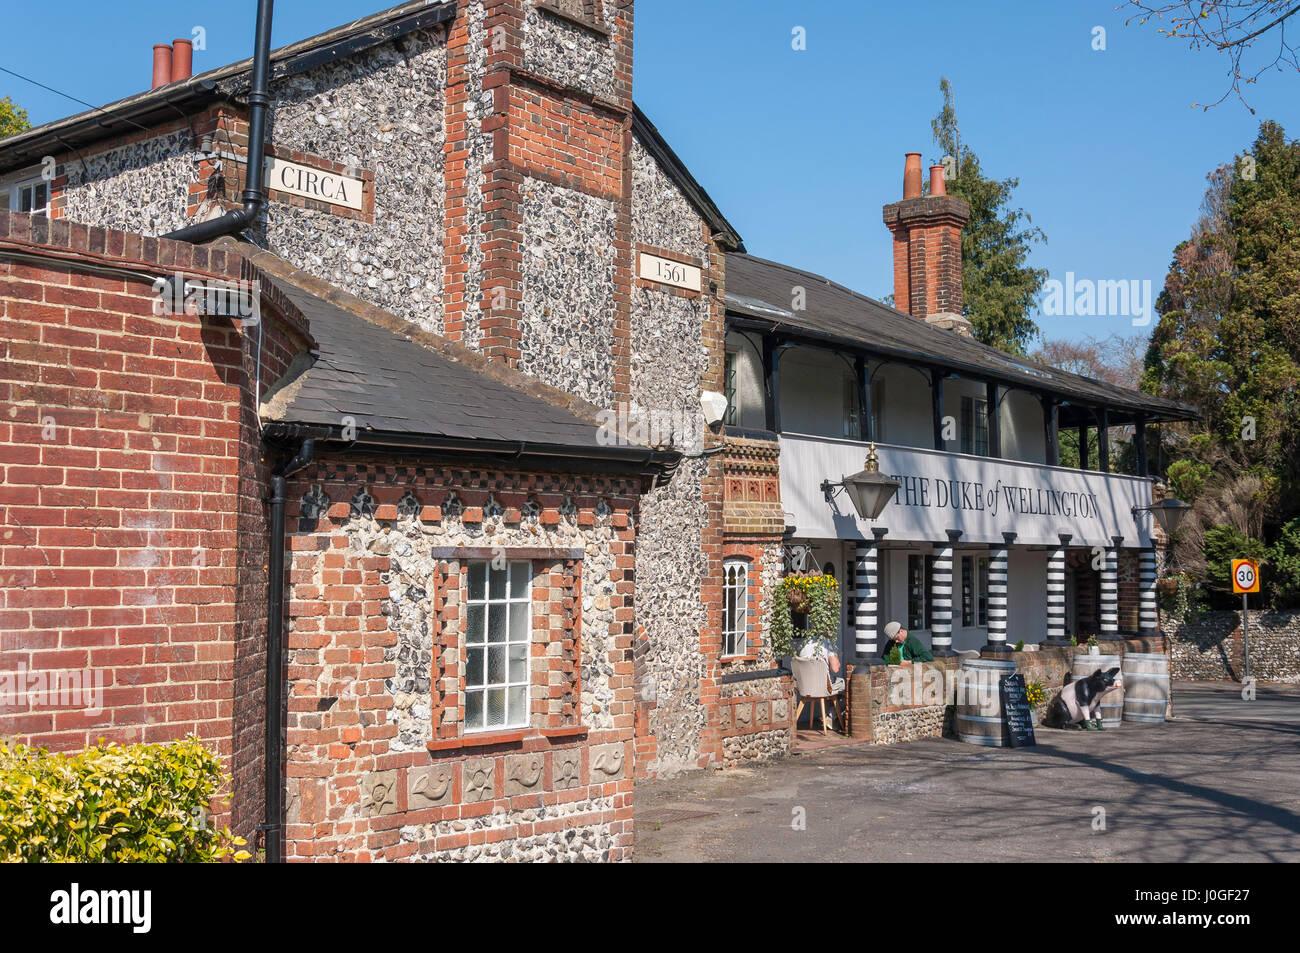 16th century The Duke of Wellington Pub, Guildford Road, East Horsley, Surrey, England, United Kingdom - Stock Image